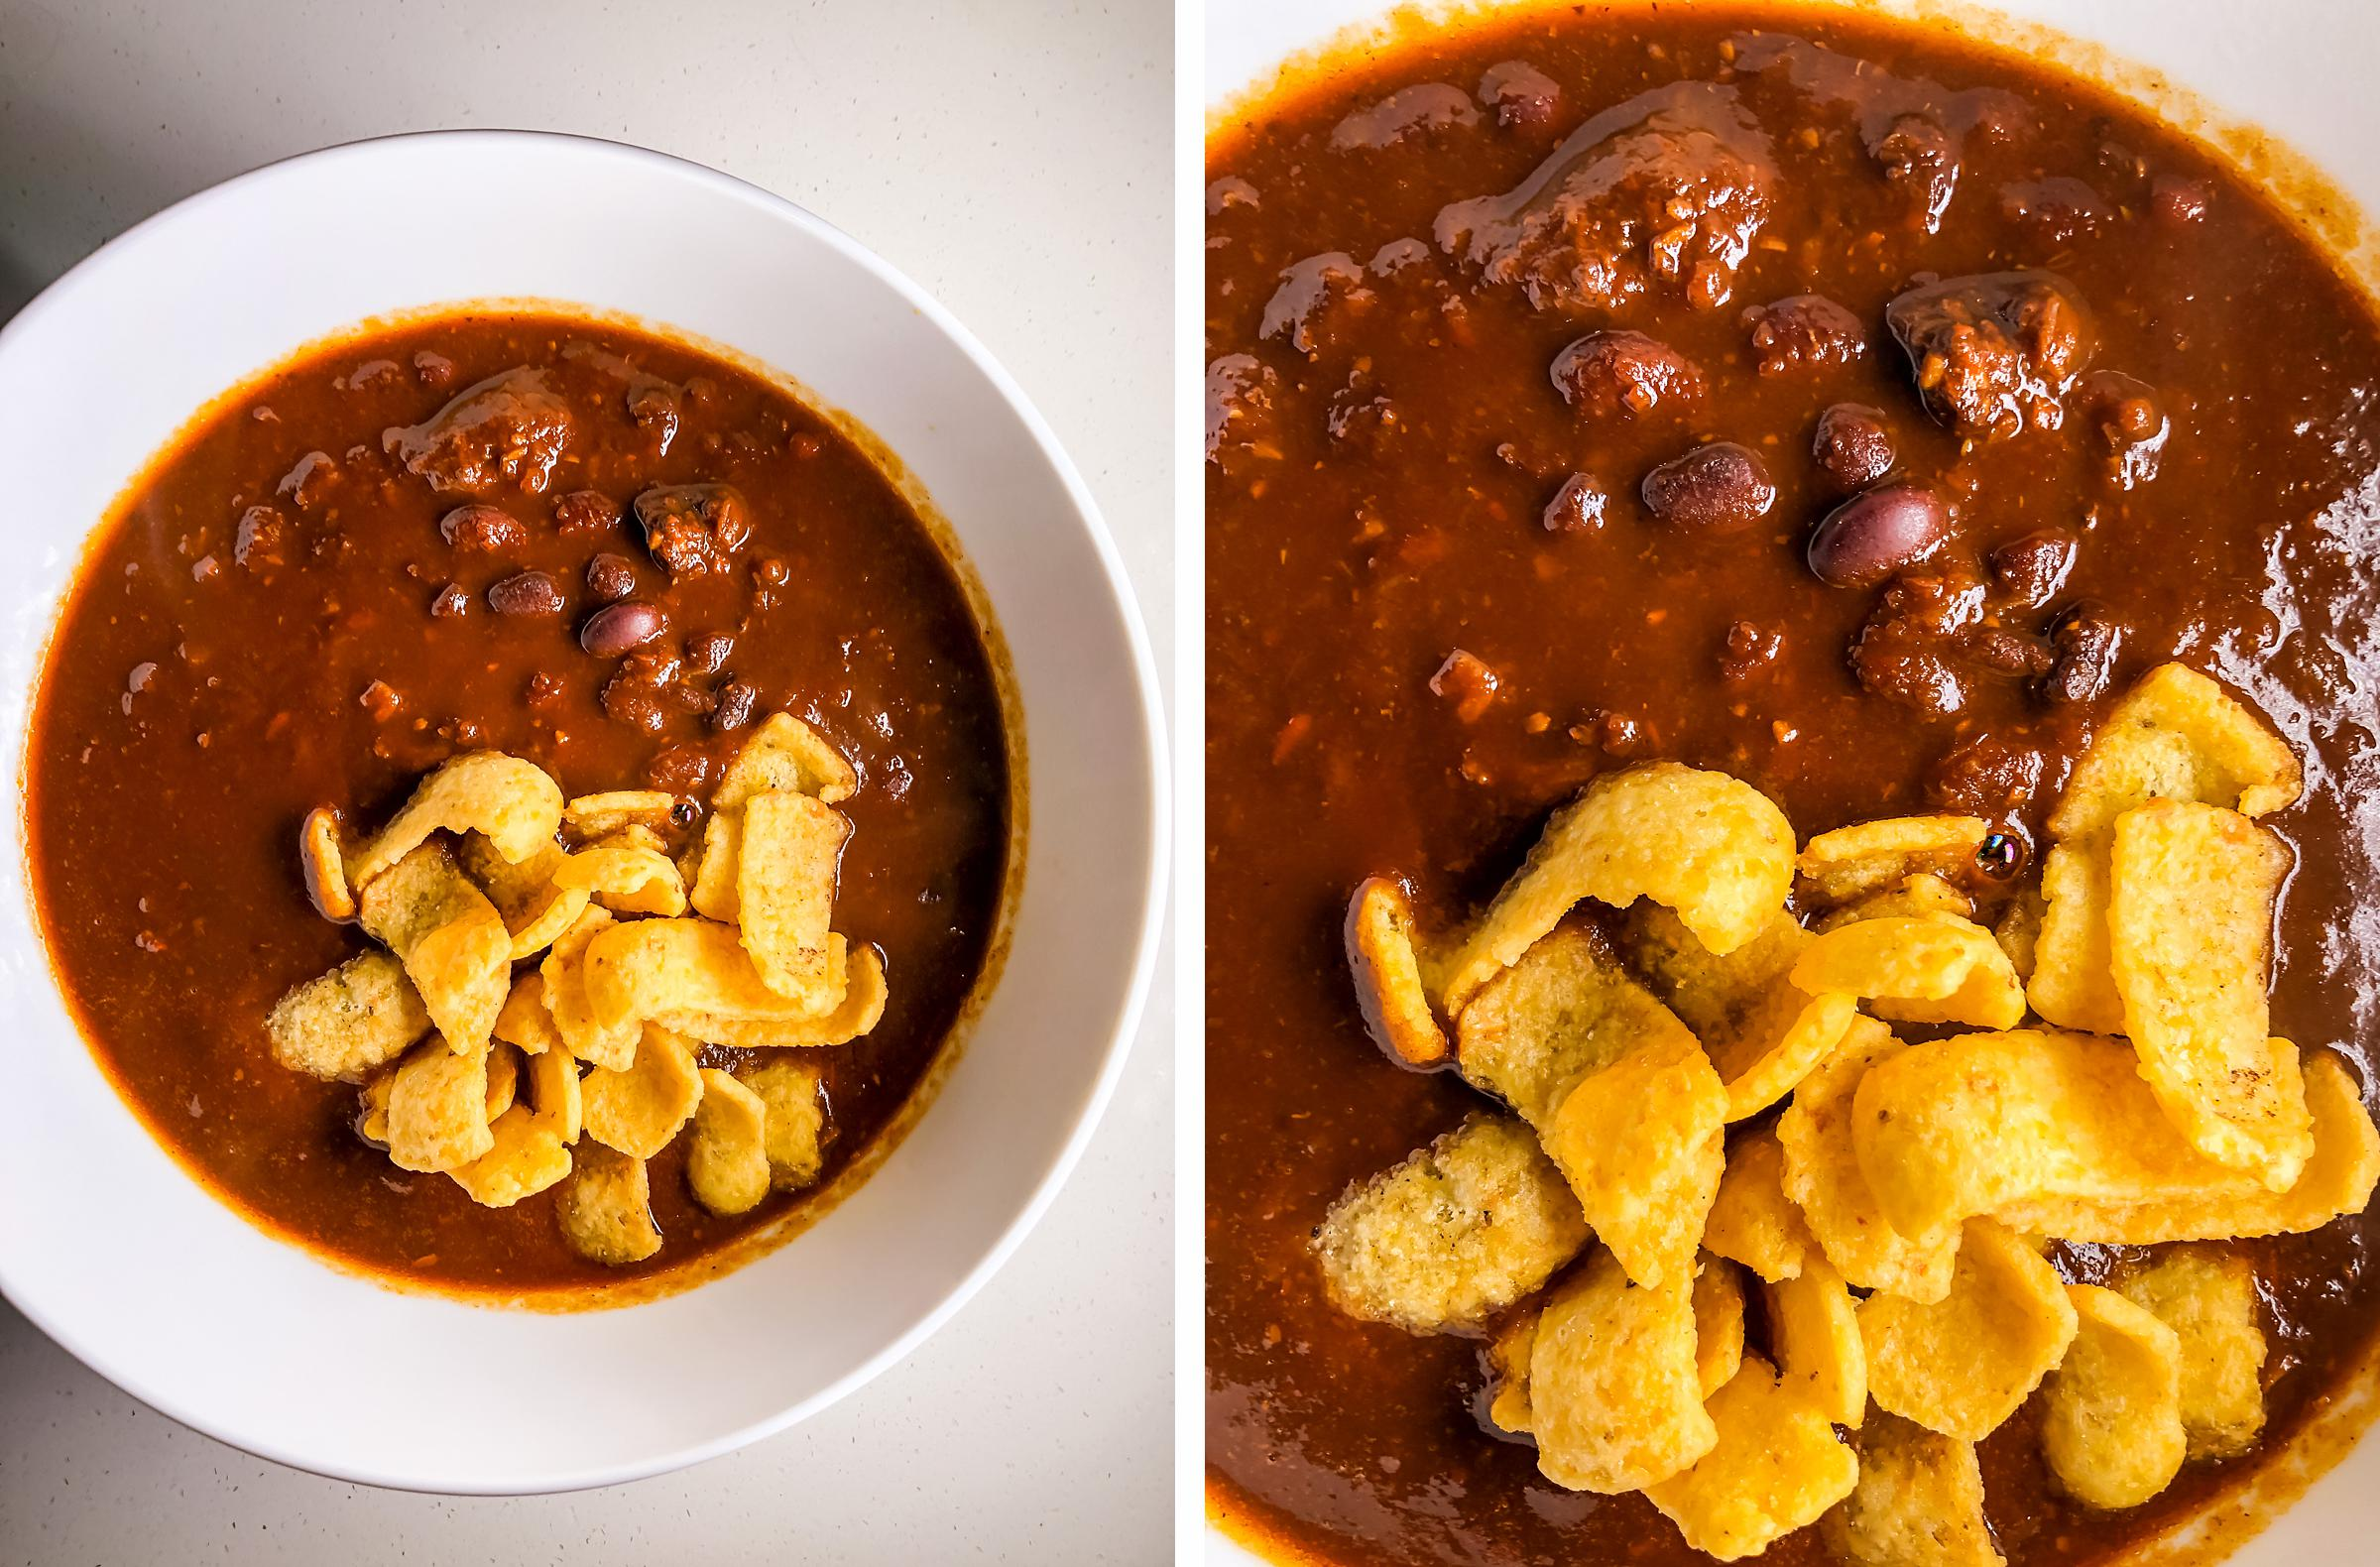 Instant pot chili recipe rancho gordo dried black beans